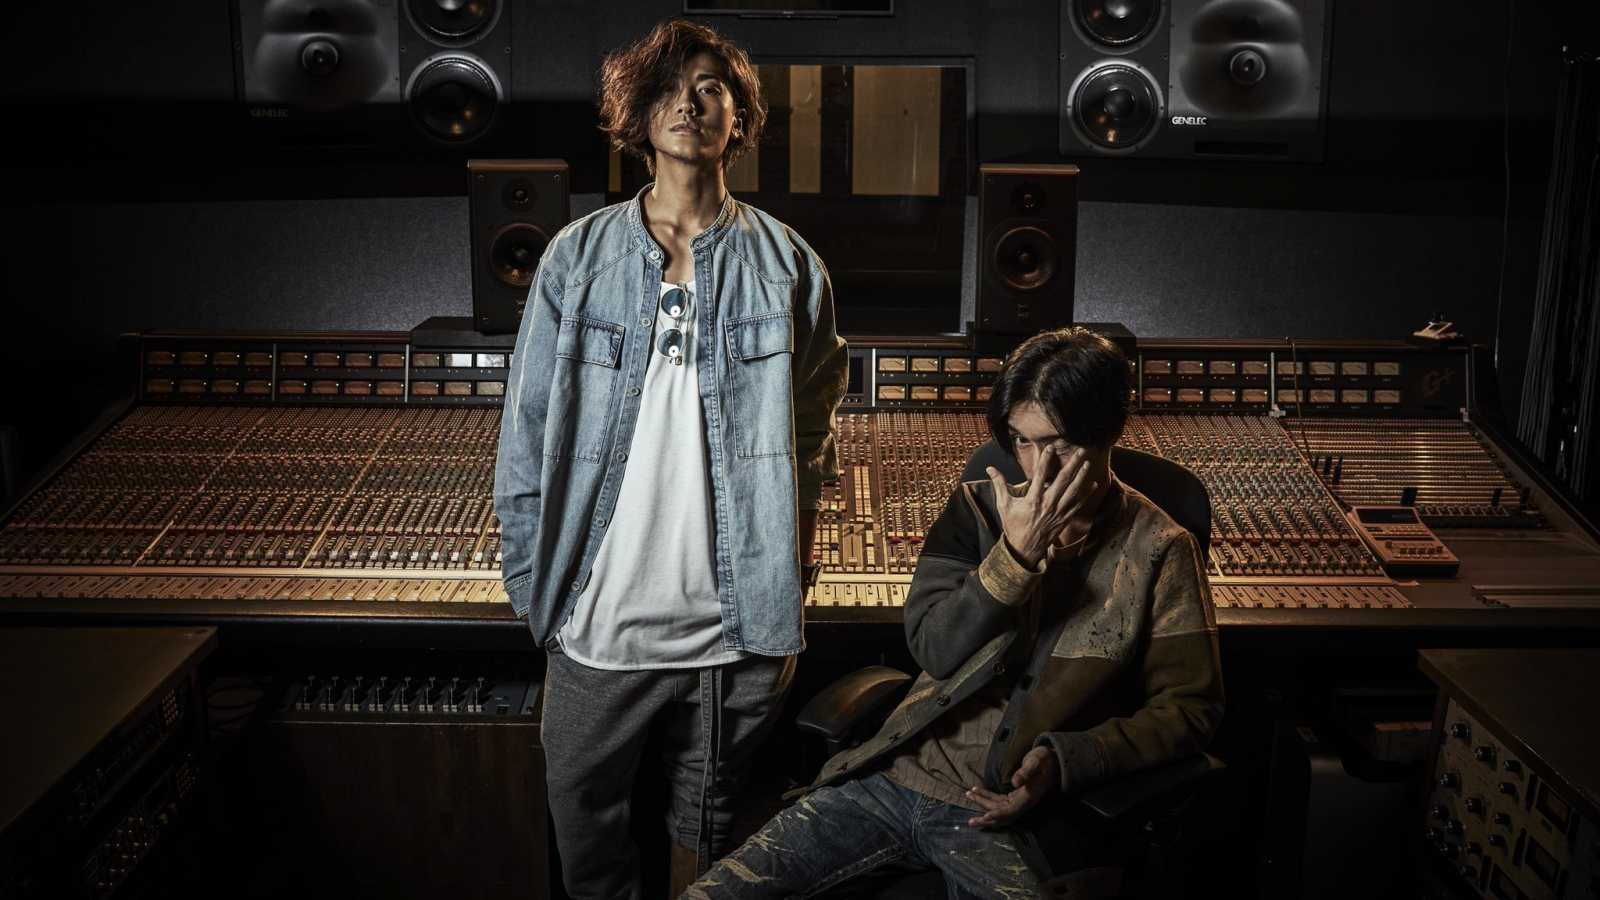 Nishikido Ryo und Akanishi Jin arbeiten nun gemeinsam © N/A. All rights reserved.